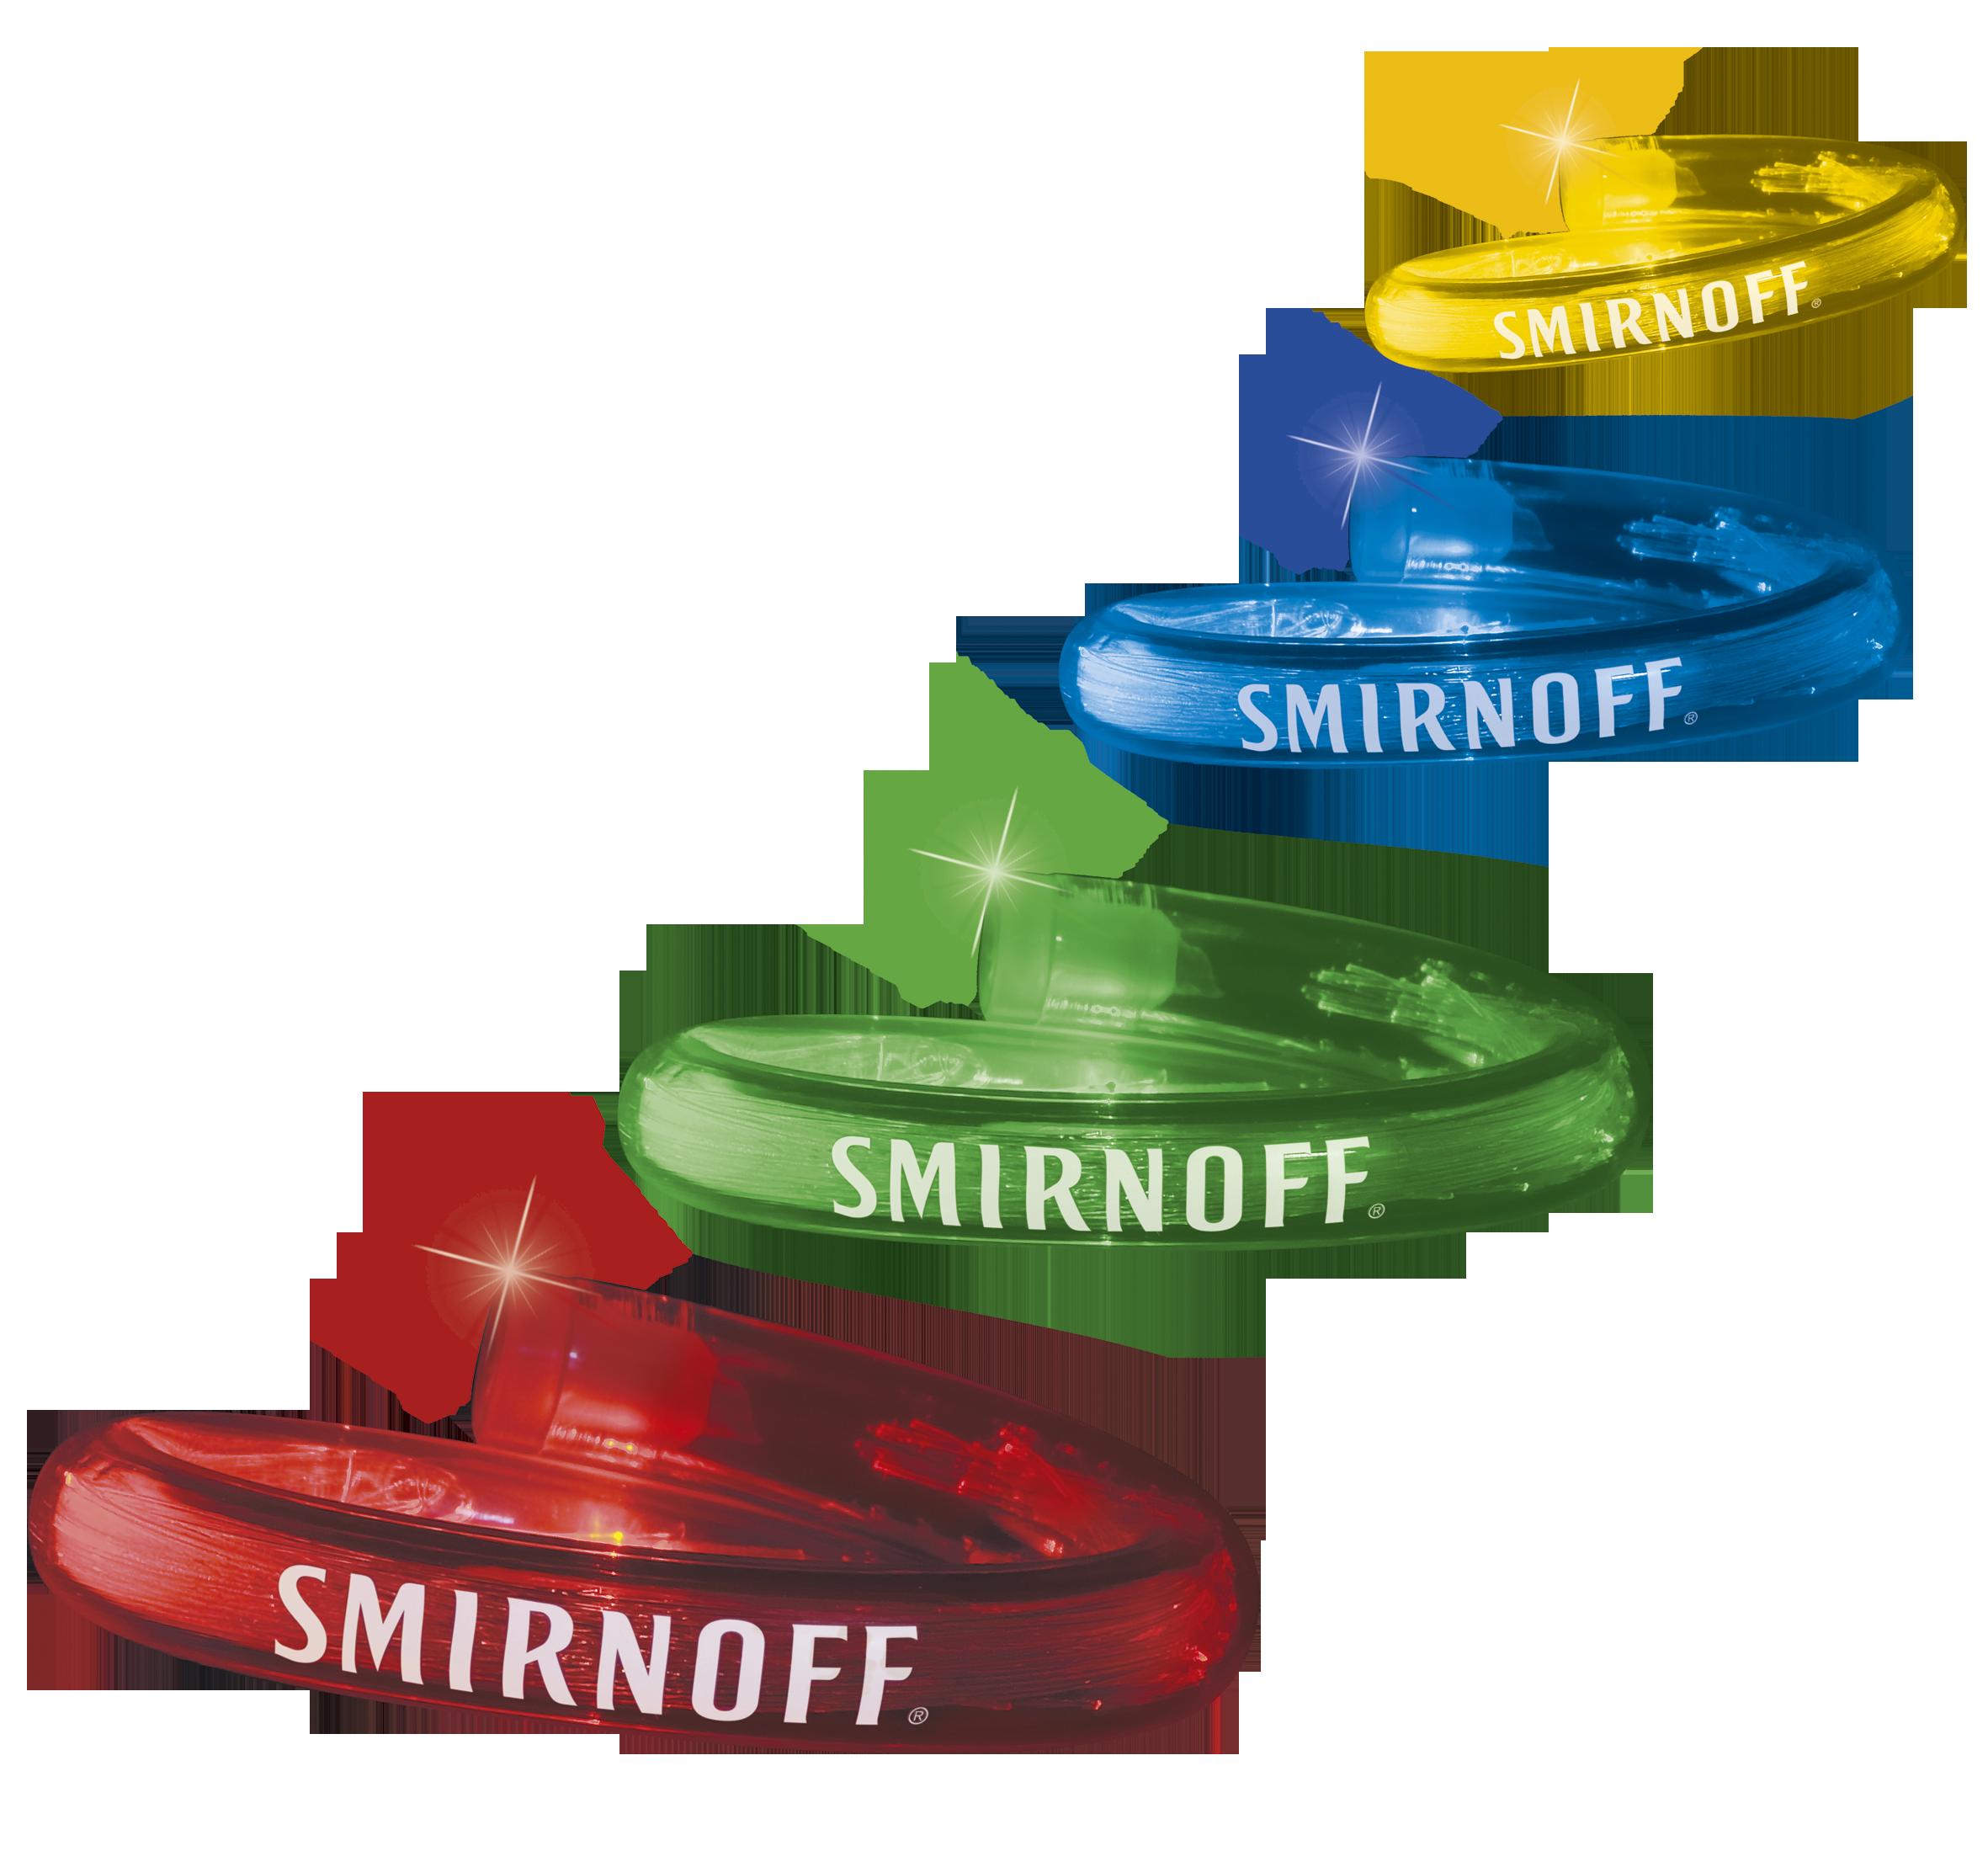 Smirnoff No. 21 Frühlingspromotion: